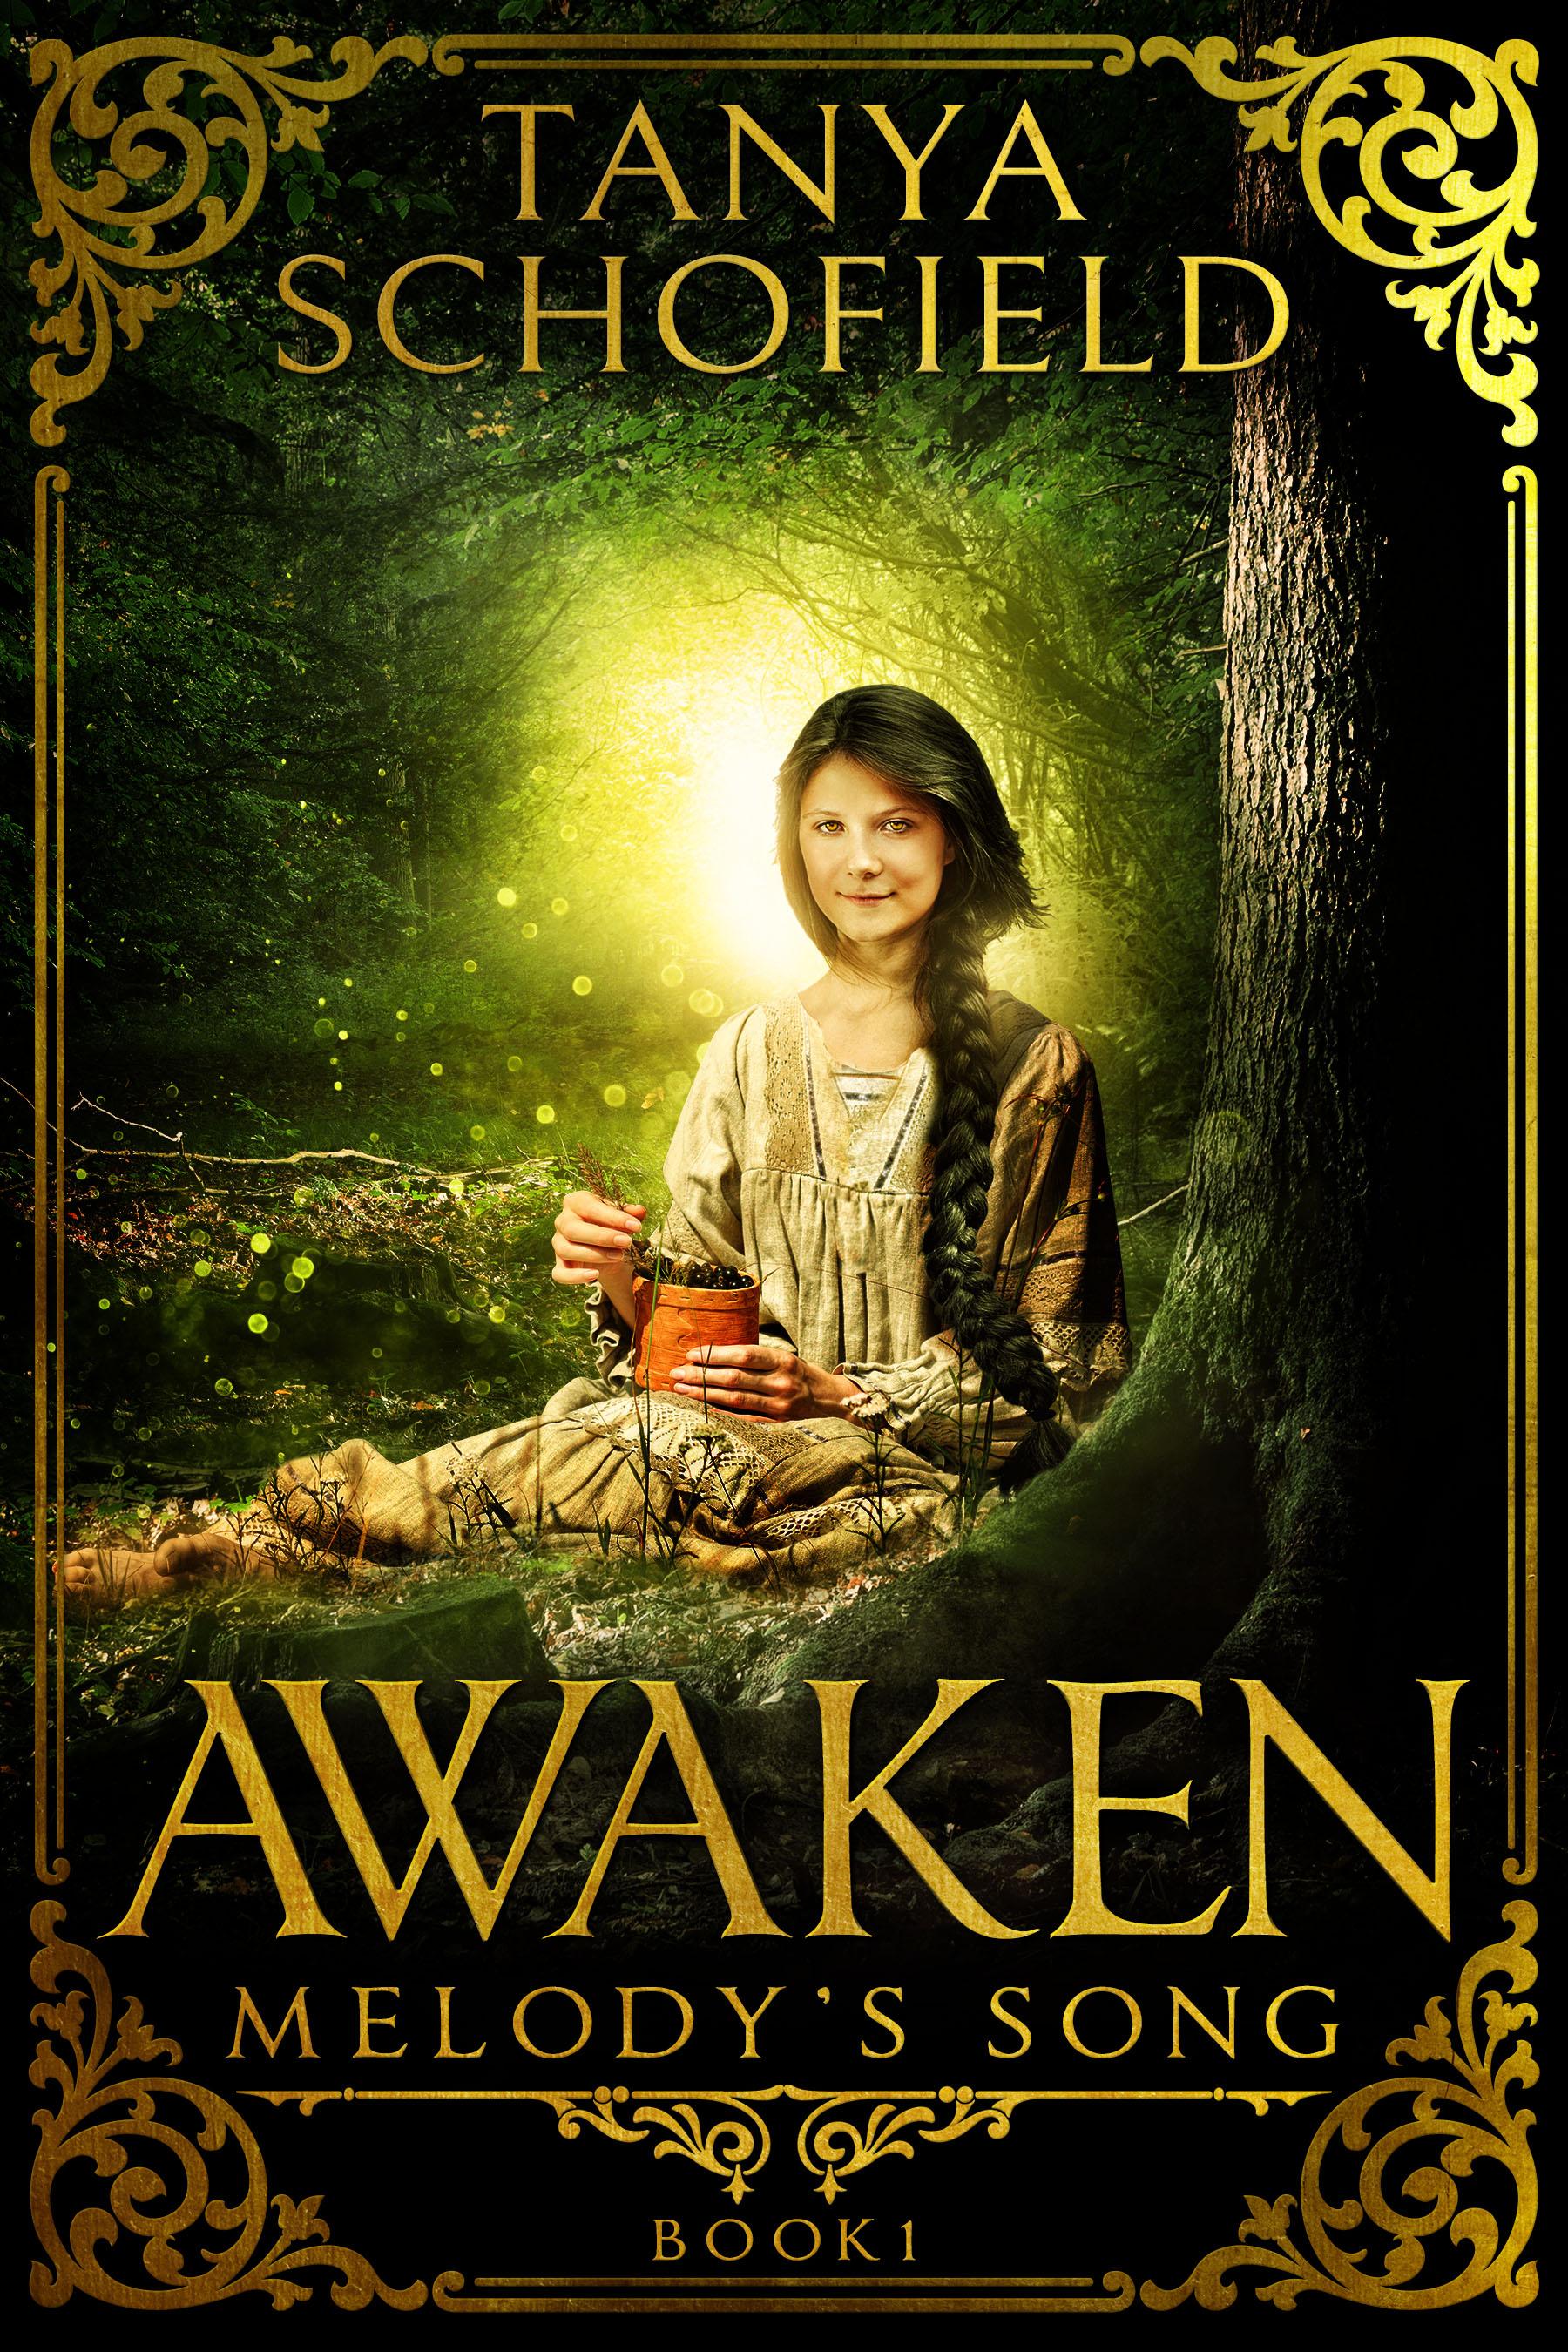 Awaken - Melody's Song Book 1.jpg